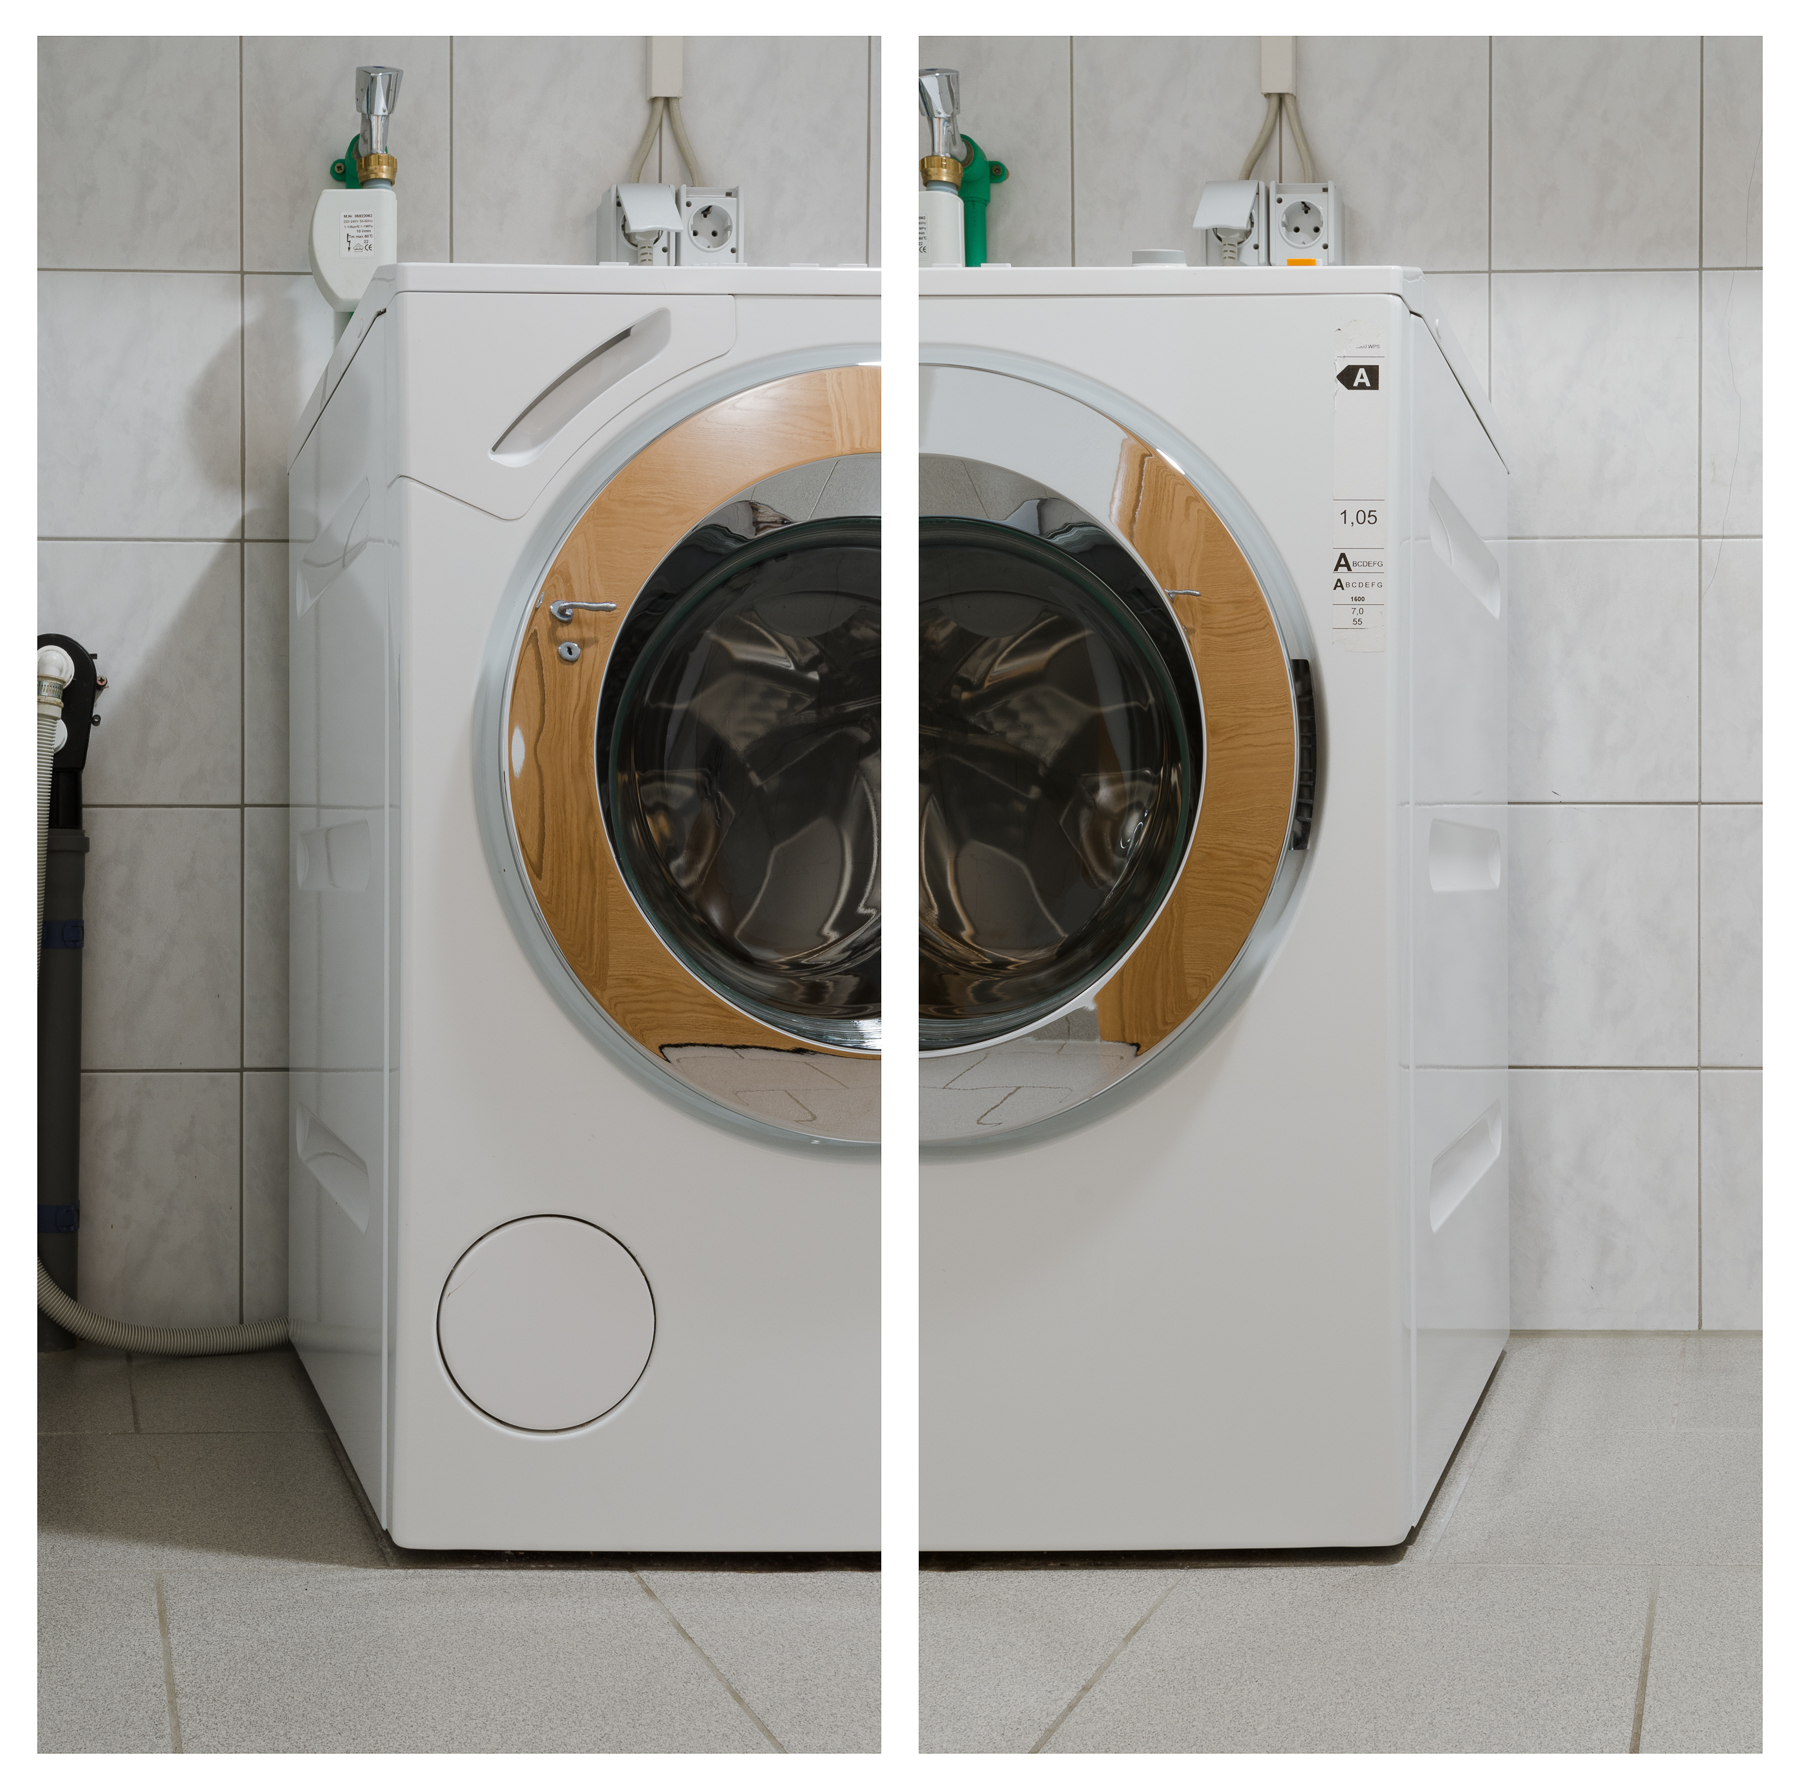 Waschmaschine, 2017 Inkjet-Pigmentdruck 2-teilig zu je 108 × 53 cm